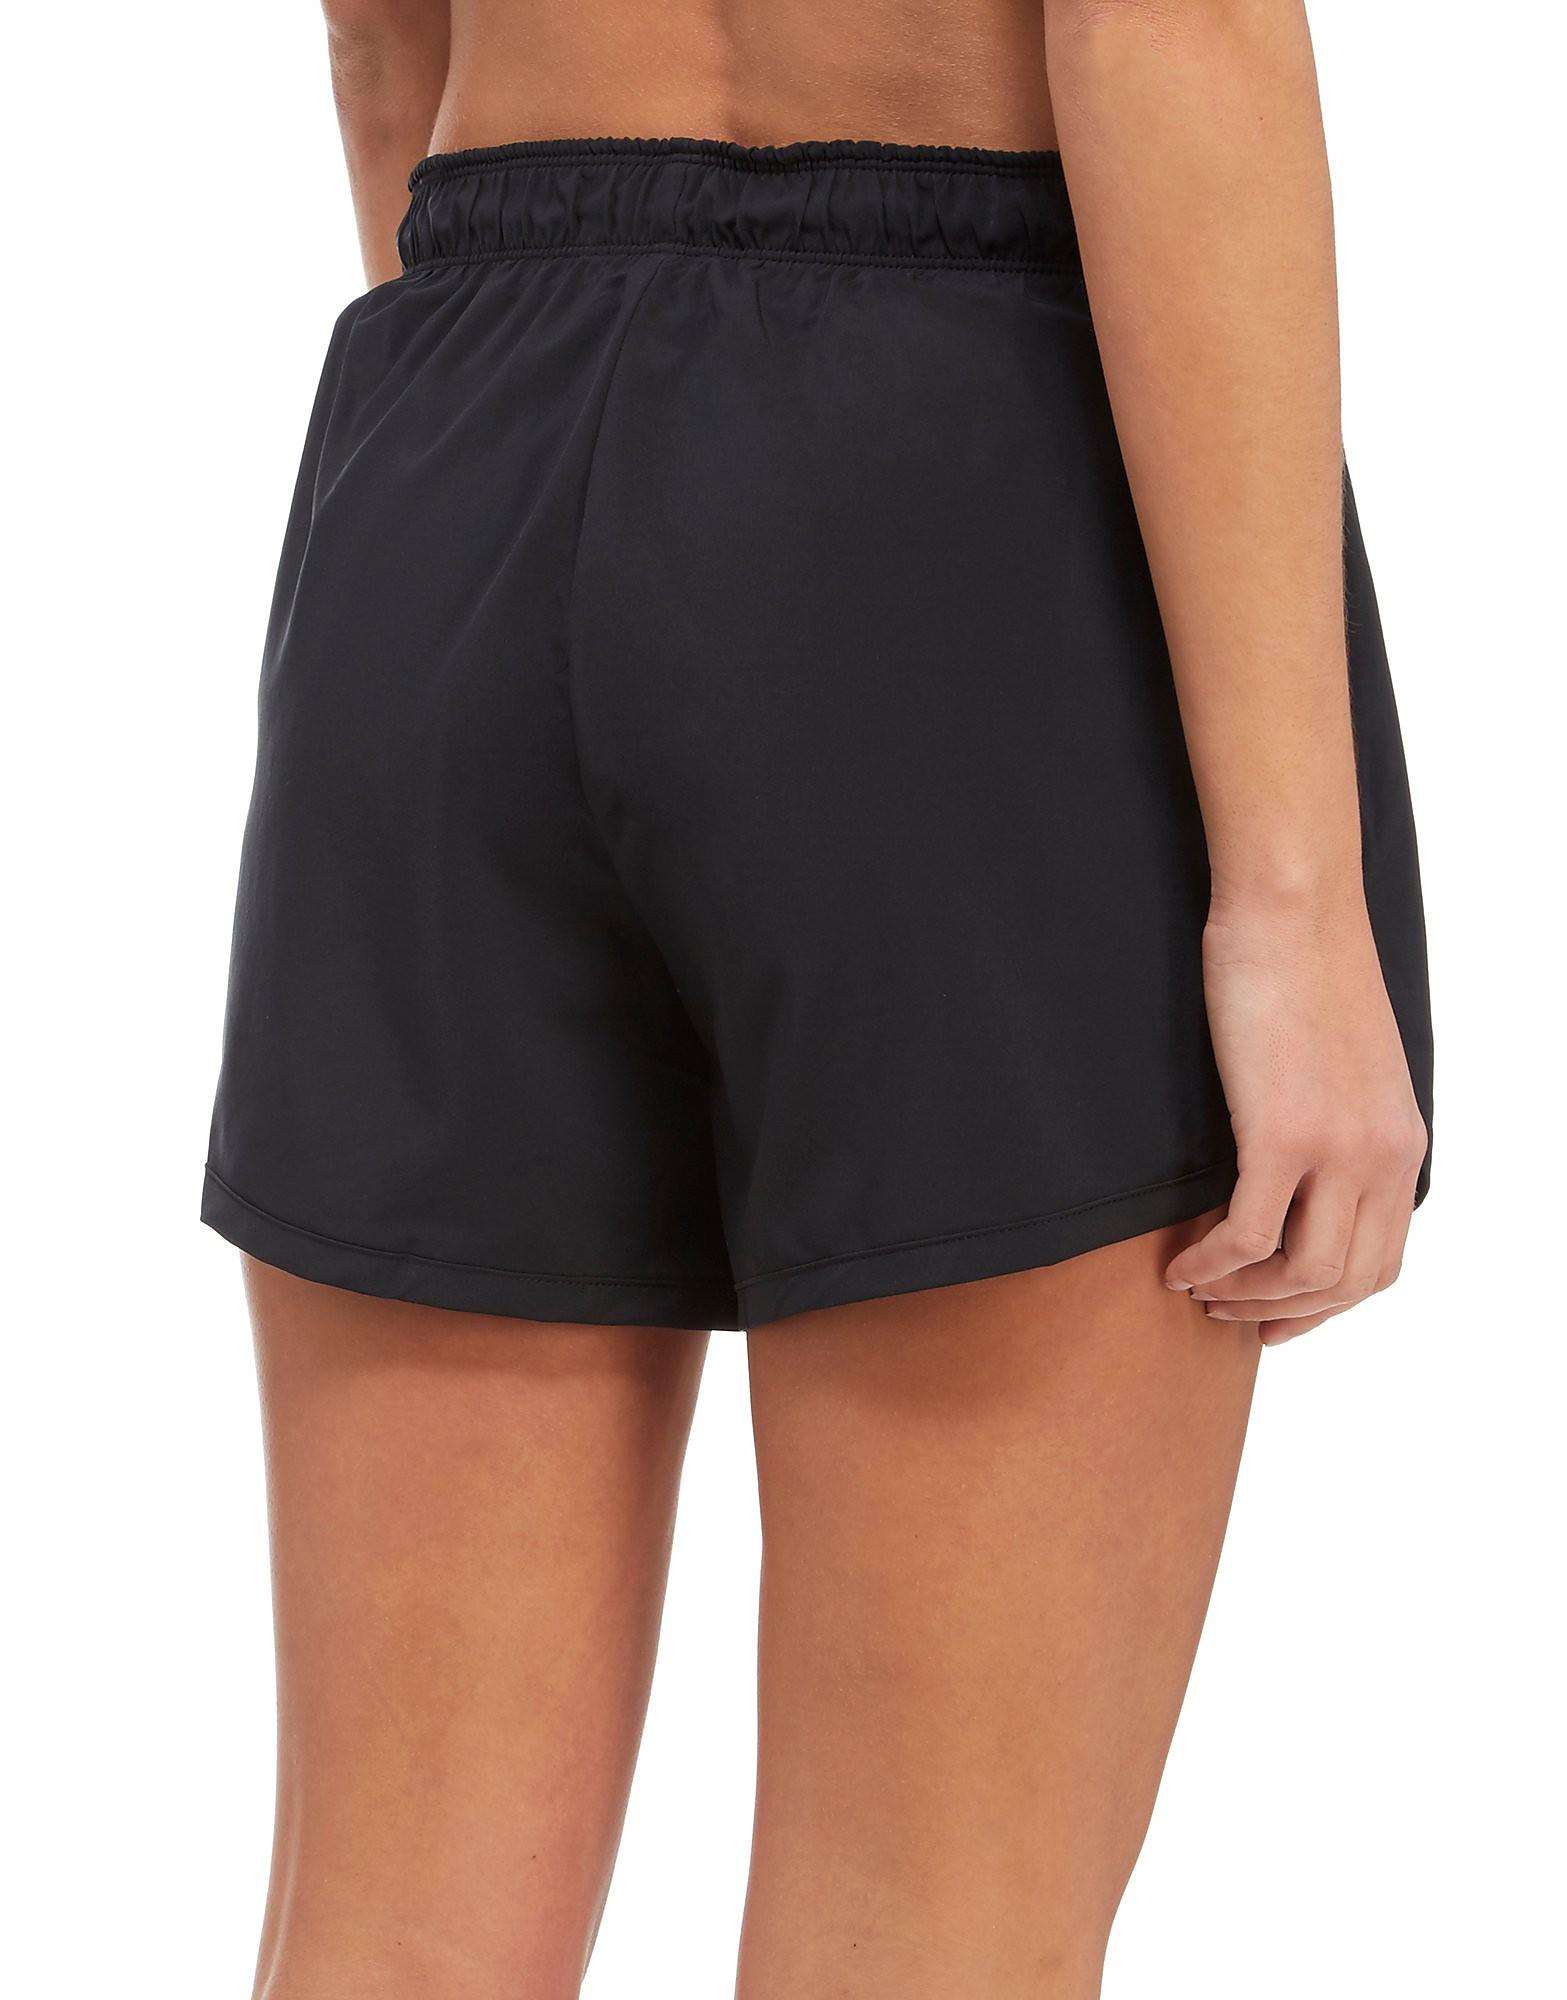 Nike Flex 2 in 1 Shorts